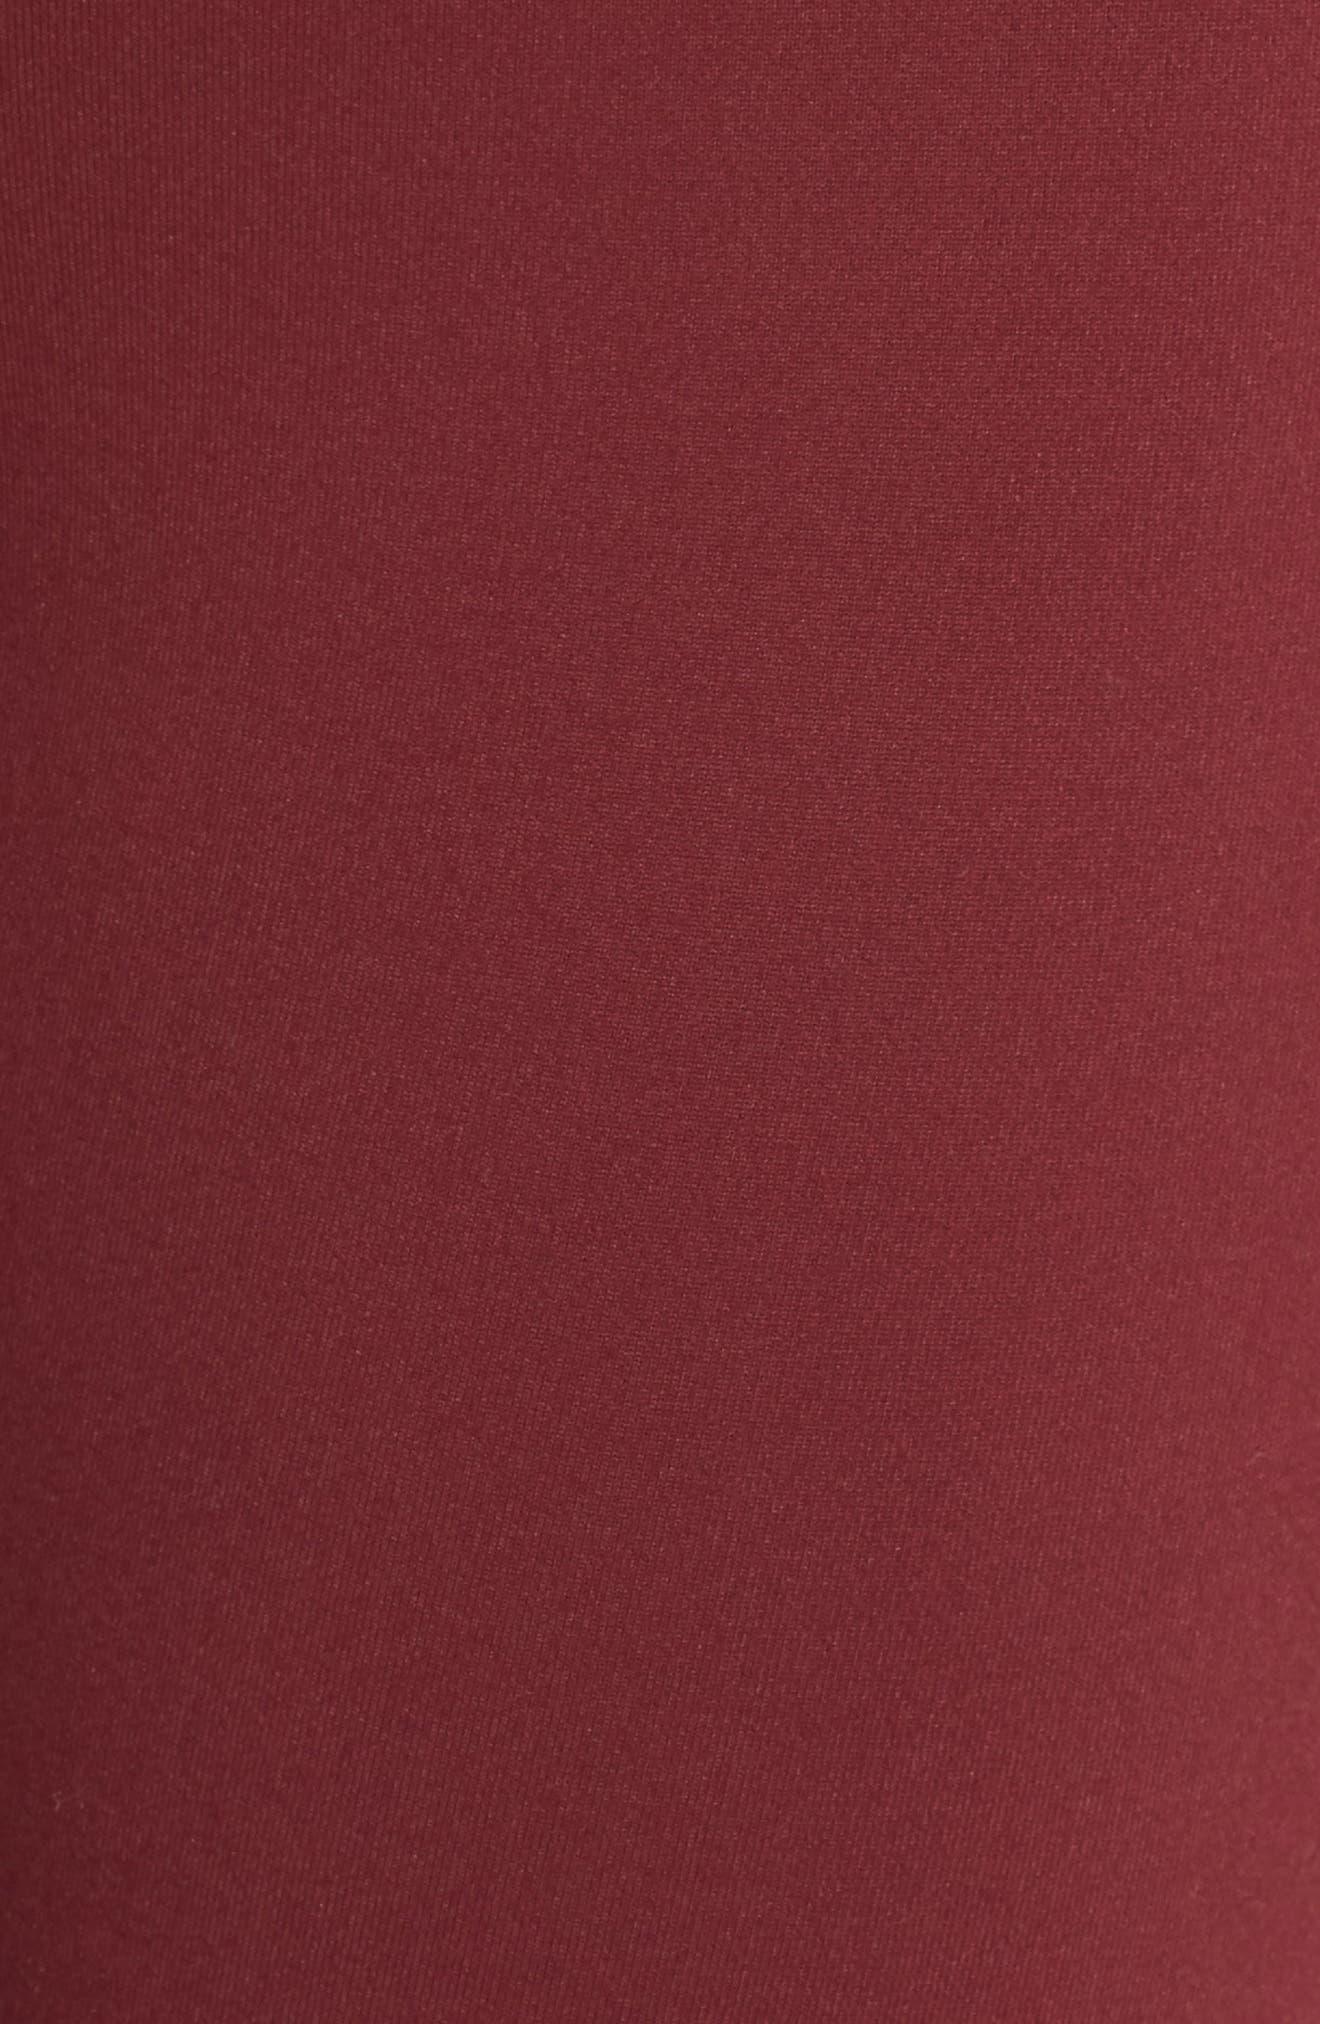 Live In Midi Leggings,                             Alternate thumbnail 29, color,